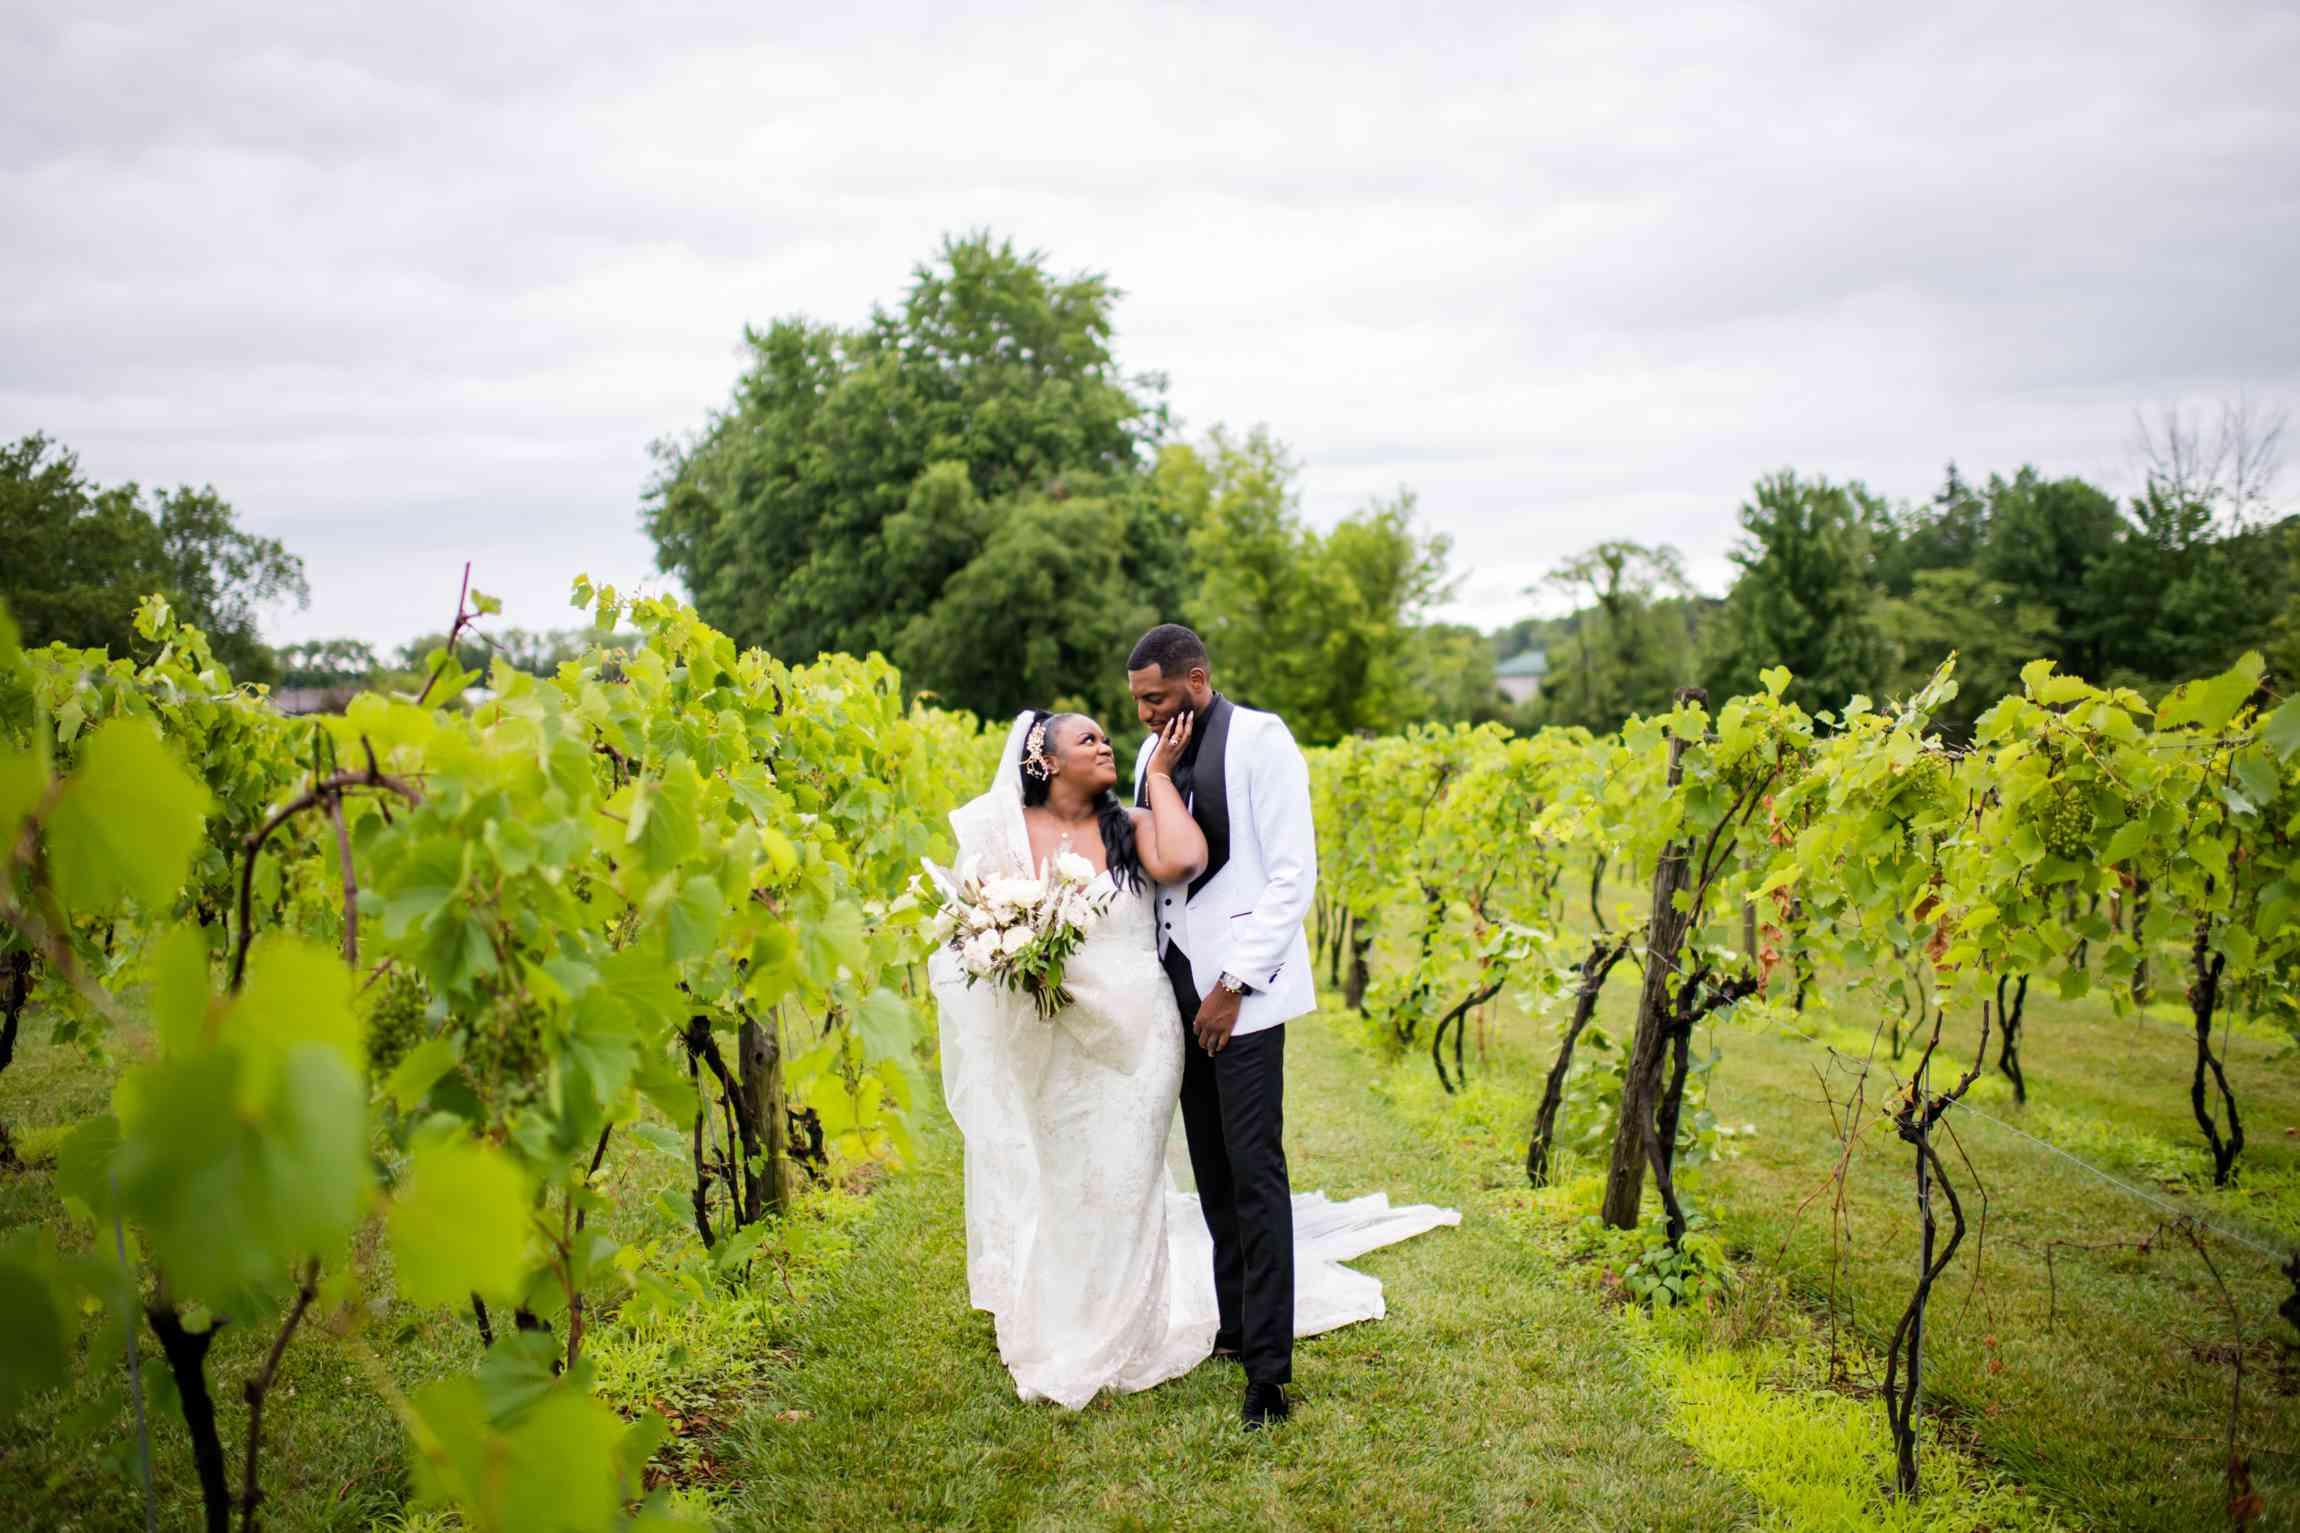 Couple portrait in the vineyard